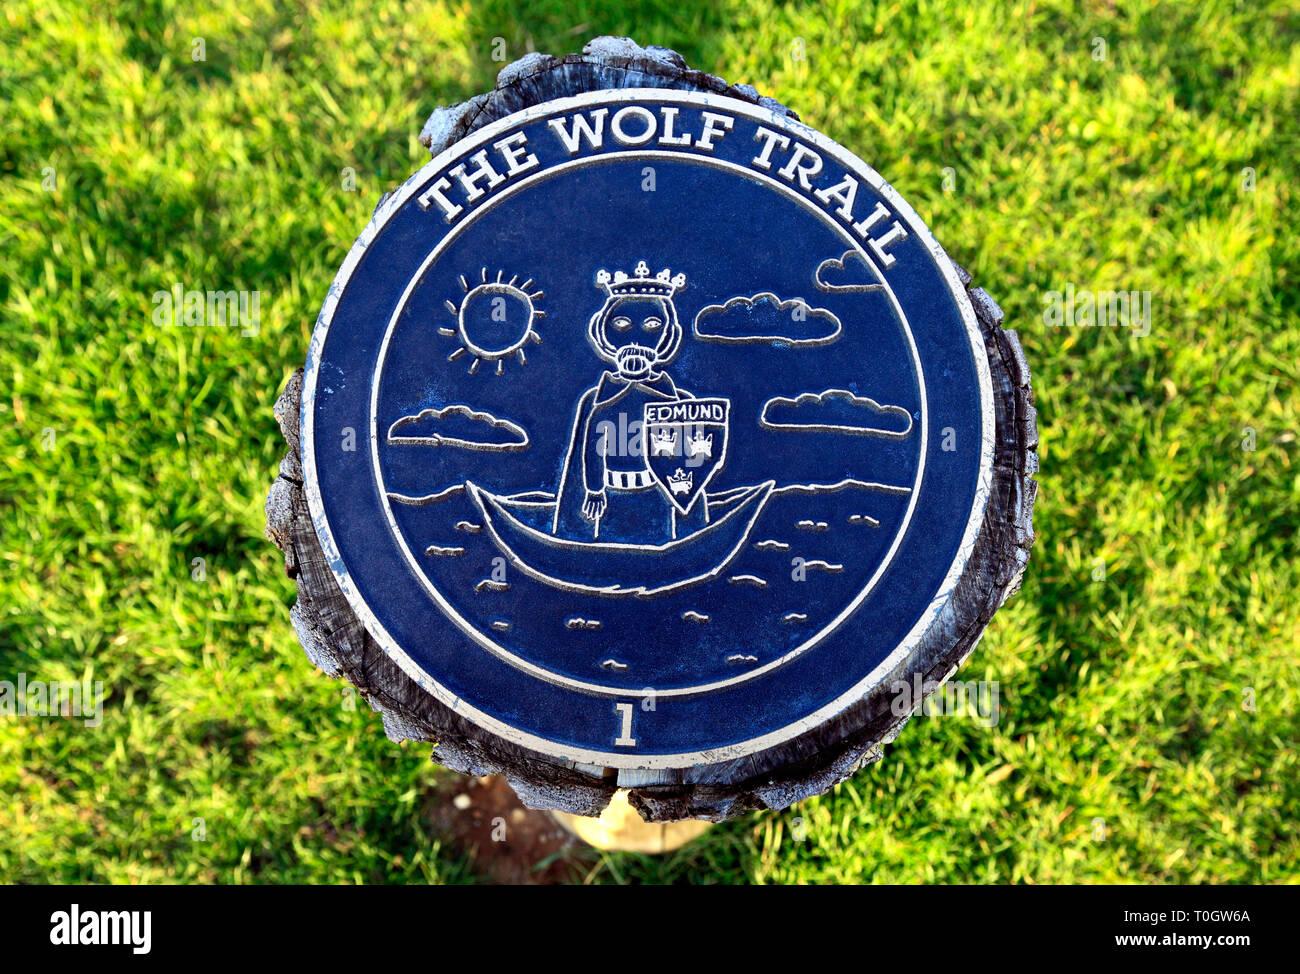 St. Edmund, The Wolf Trail, Esplanade Gardens, Hunstanton, Norfolk, UK, commemorative, plaque - Stock Image